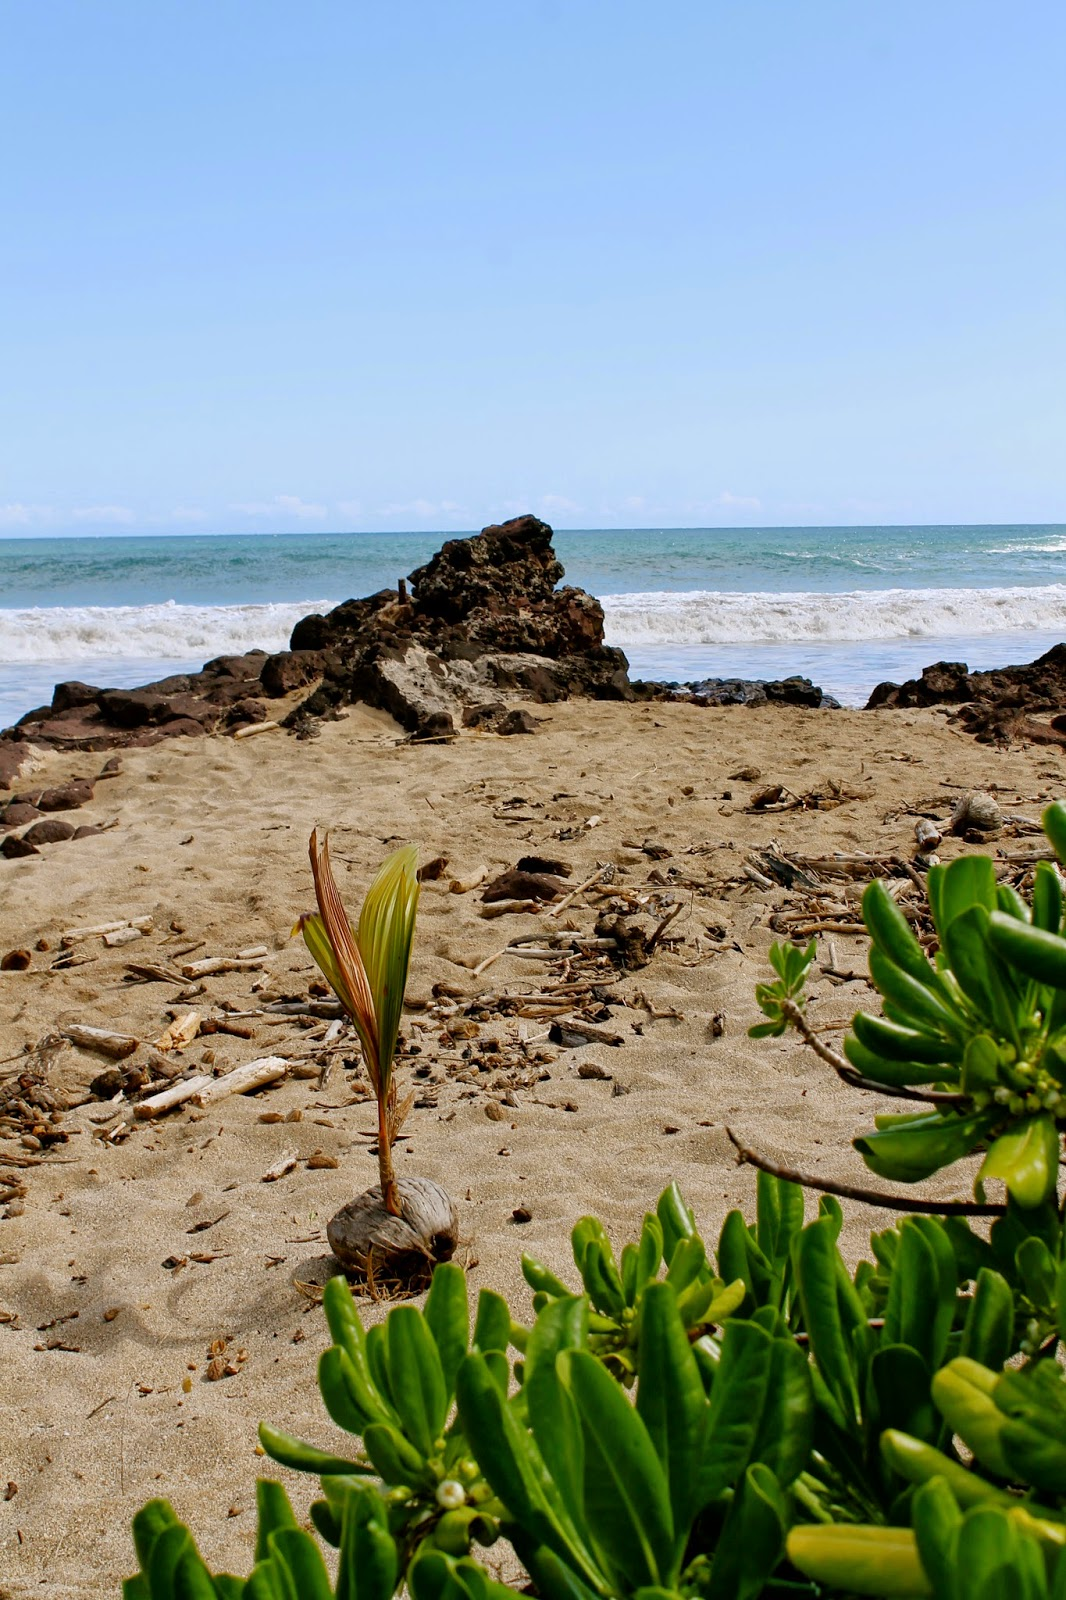 Justin D. Kondrat : Next Chapter at The National Tropical Botanical ...